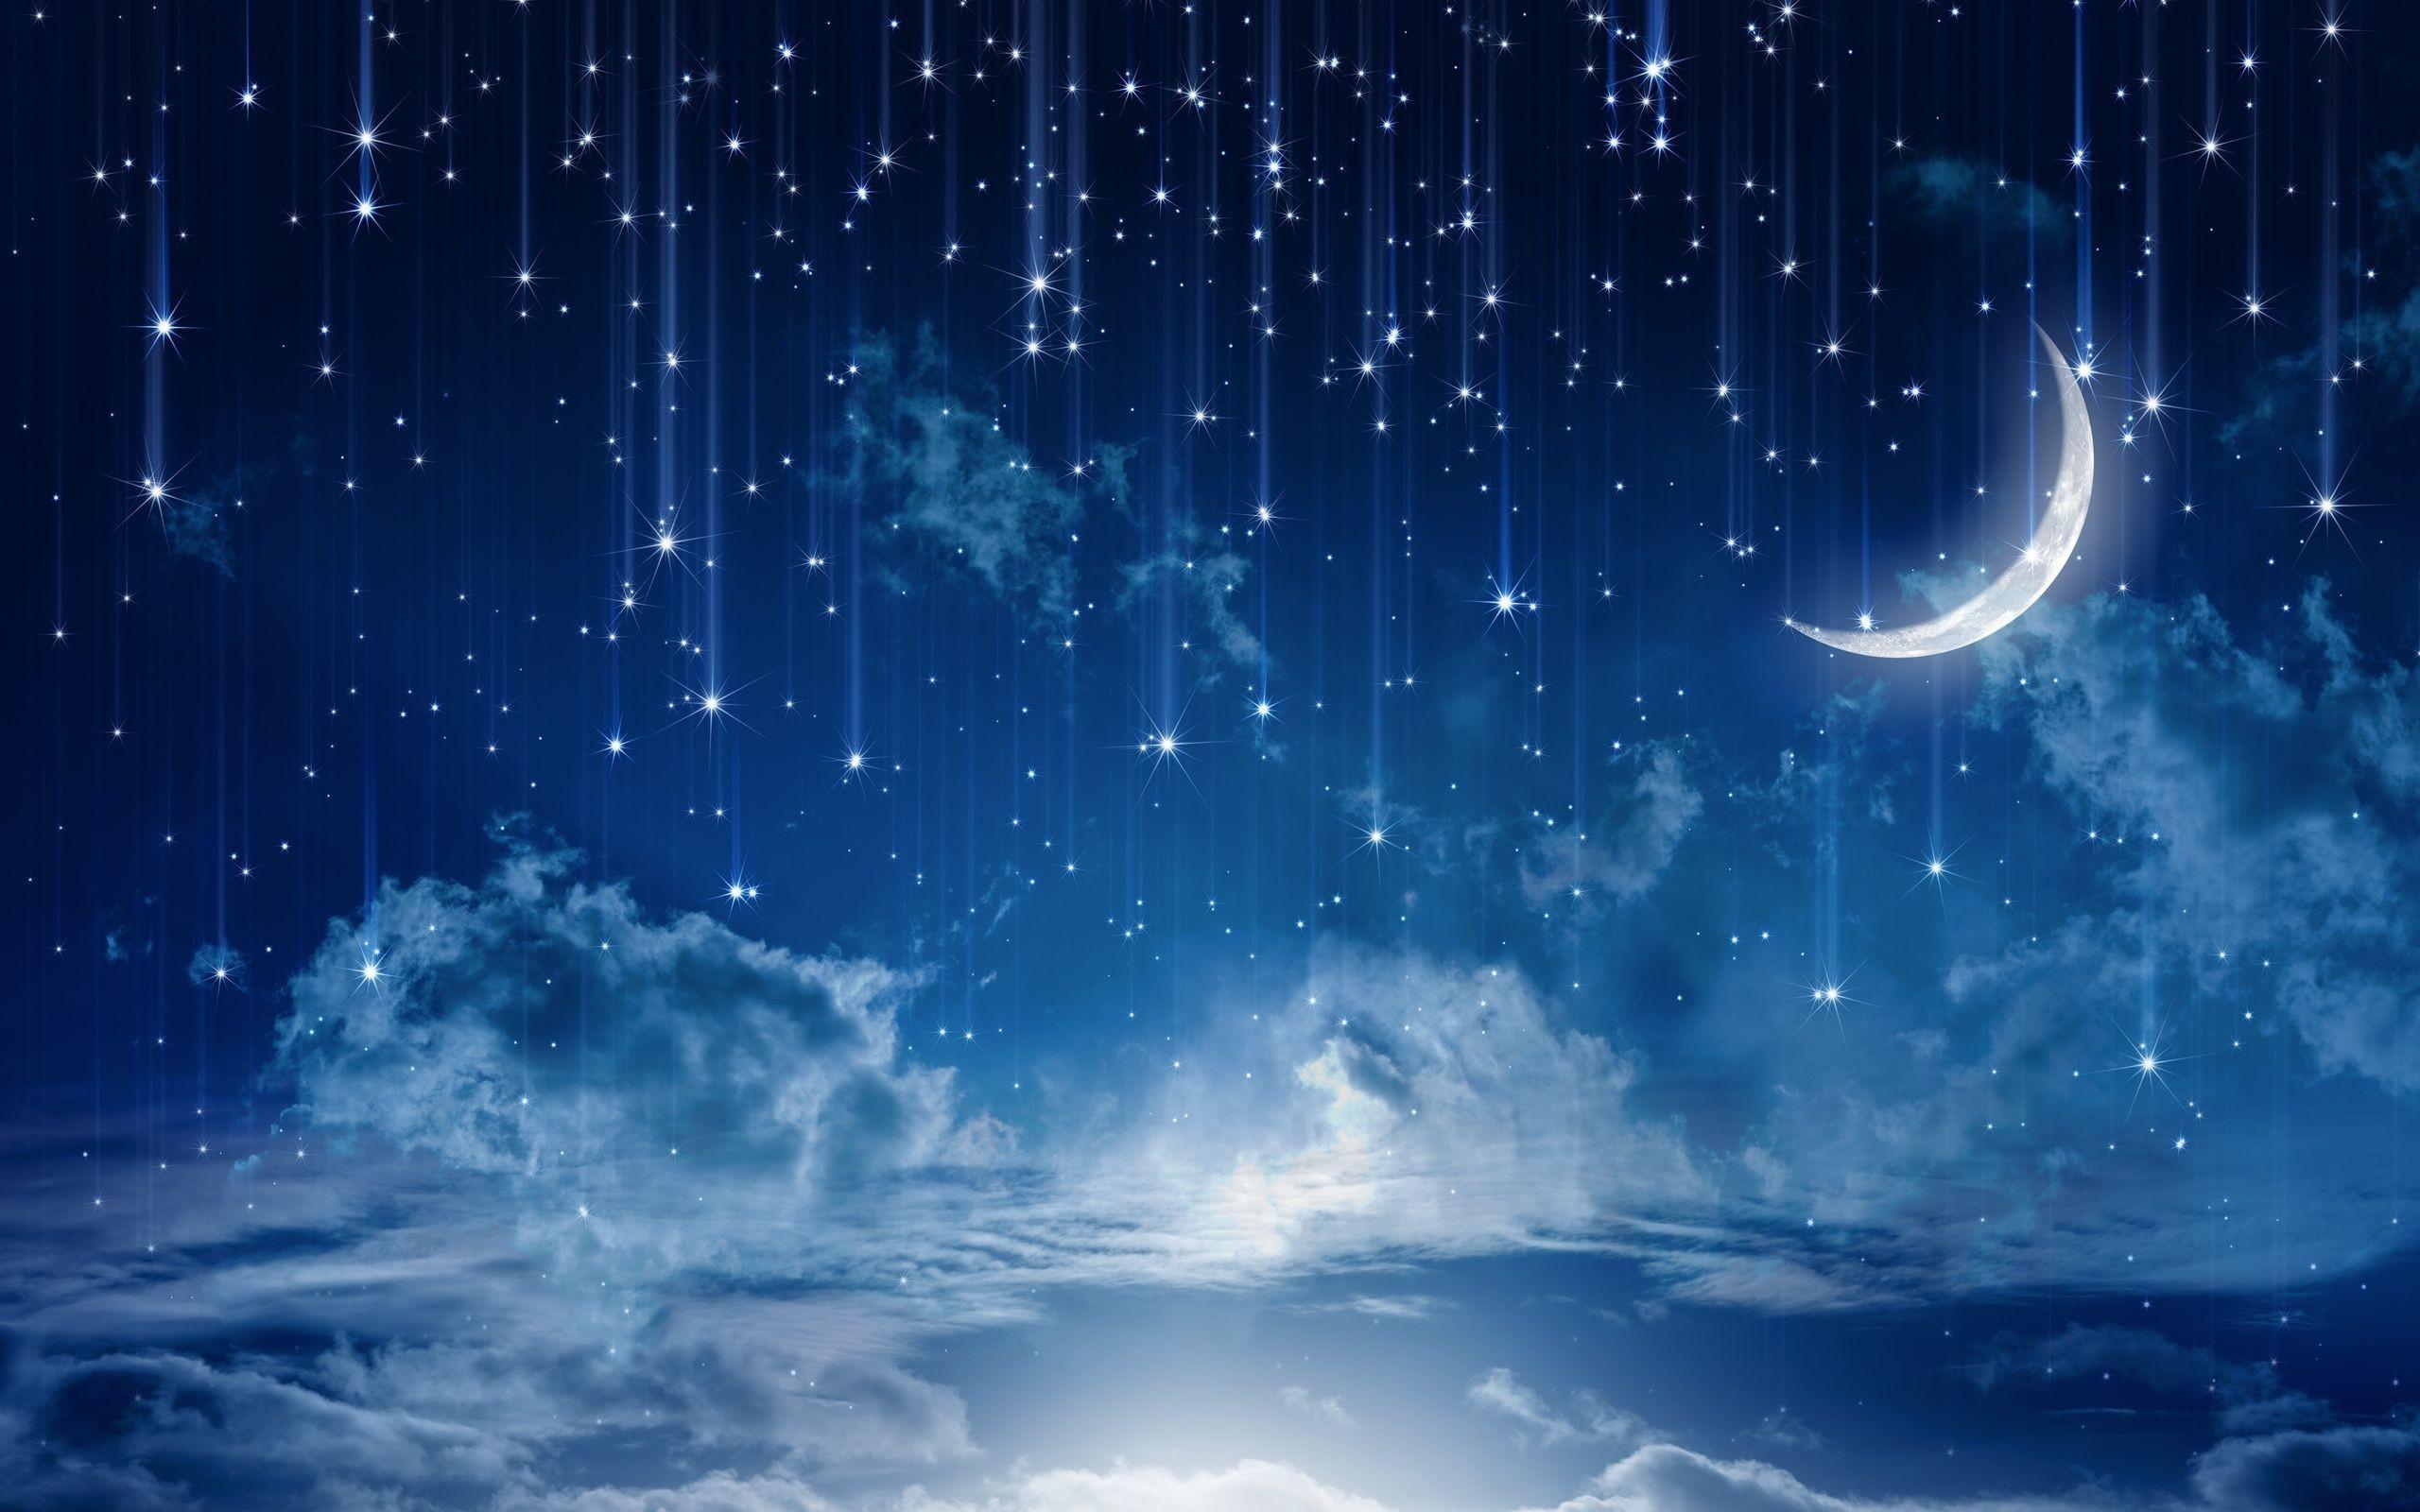 Pleiades Star Cluster HD desktop wallpaper High Definition · Night Sky …